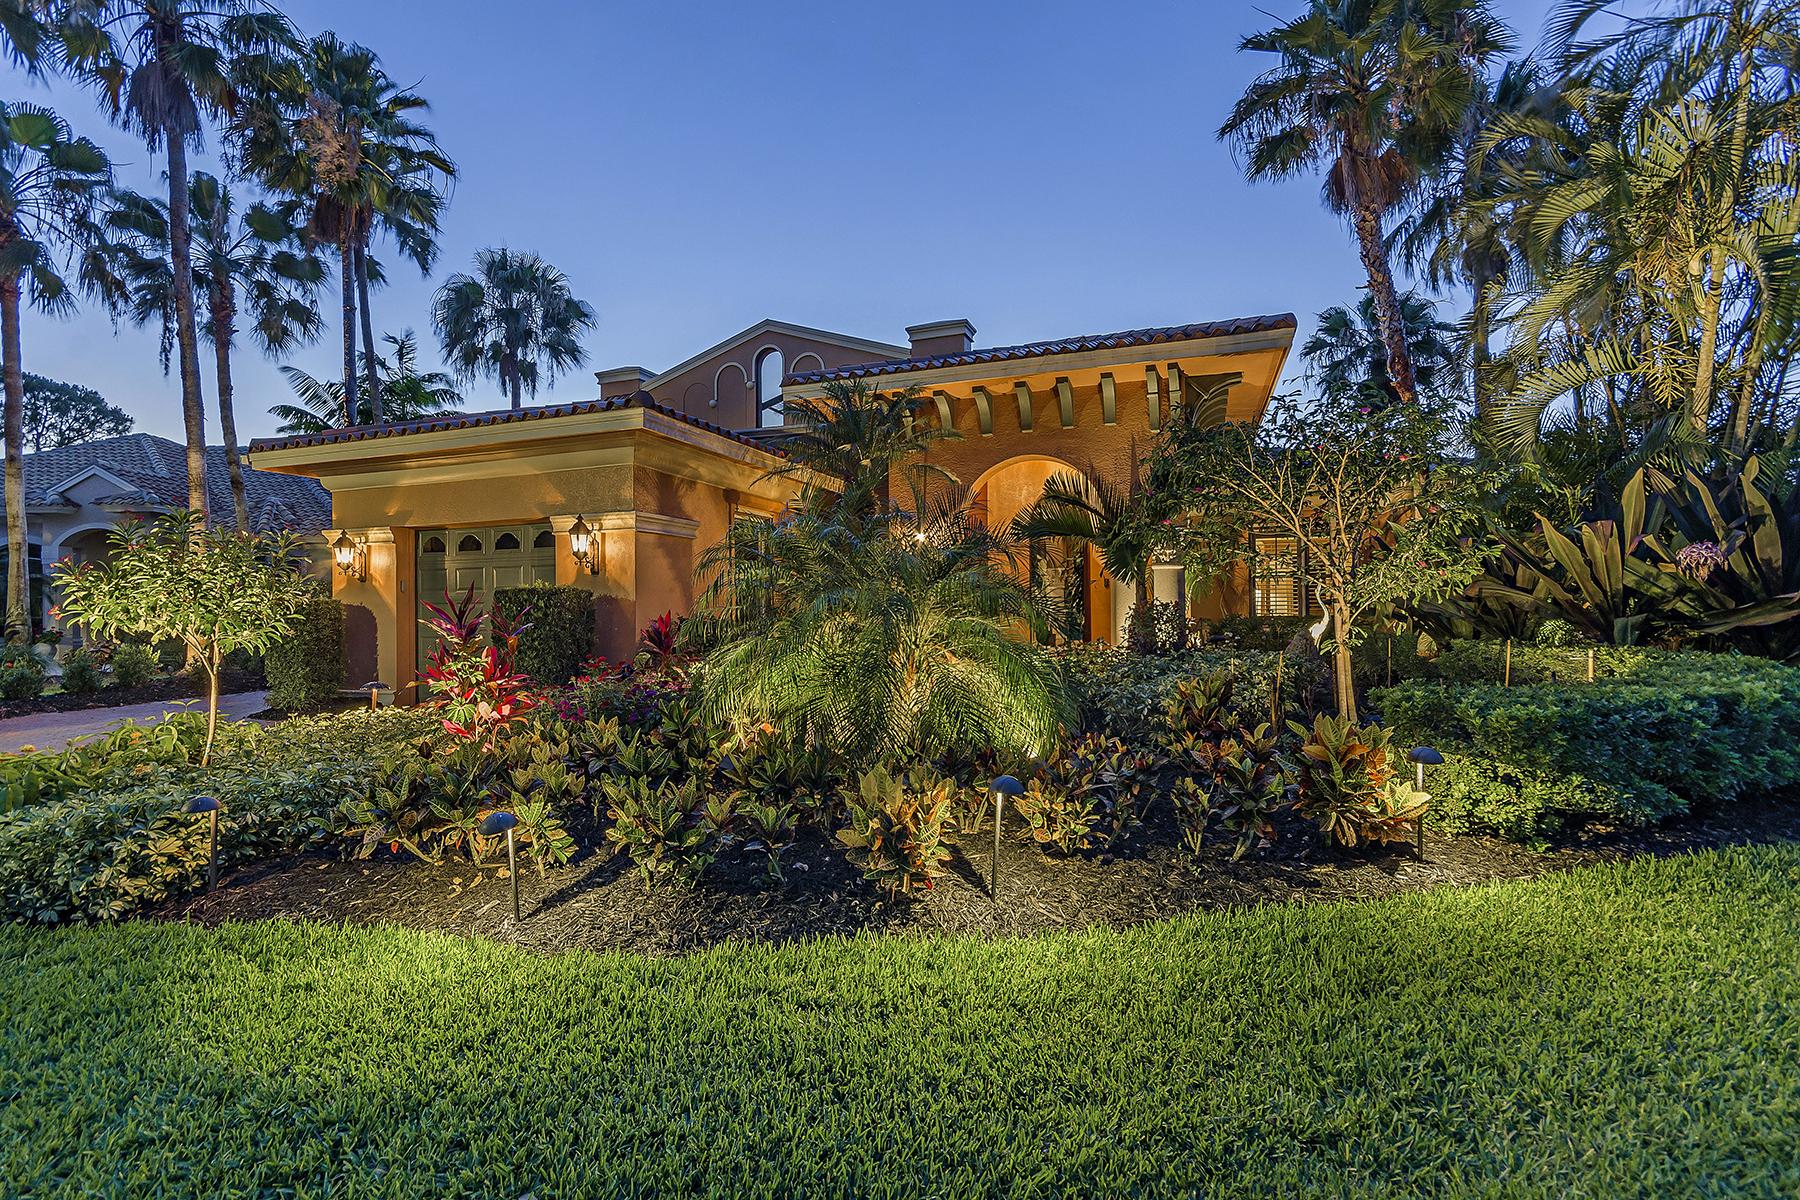 Casa Unifamiliar por un Venta en Naples 2929 Gardens Blvd Naples, Florida, 34105 Estados Unidos